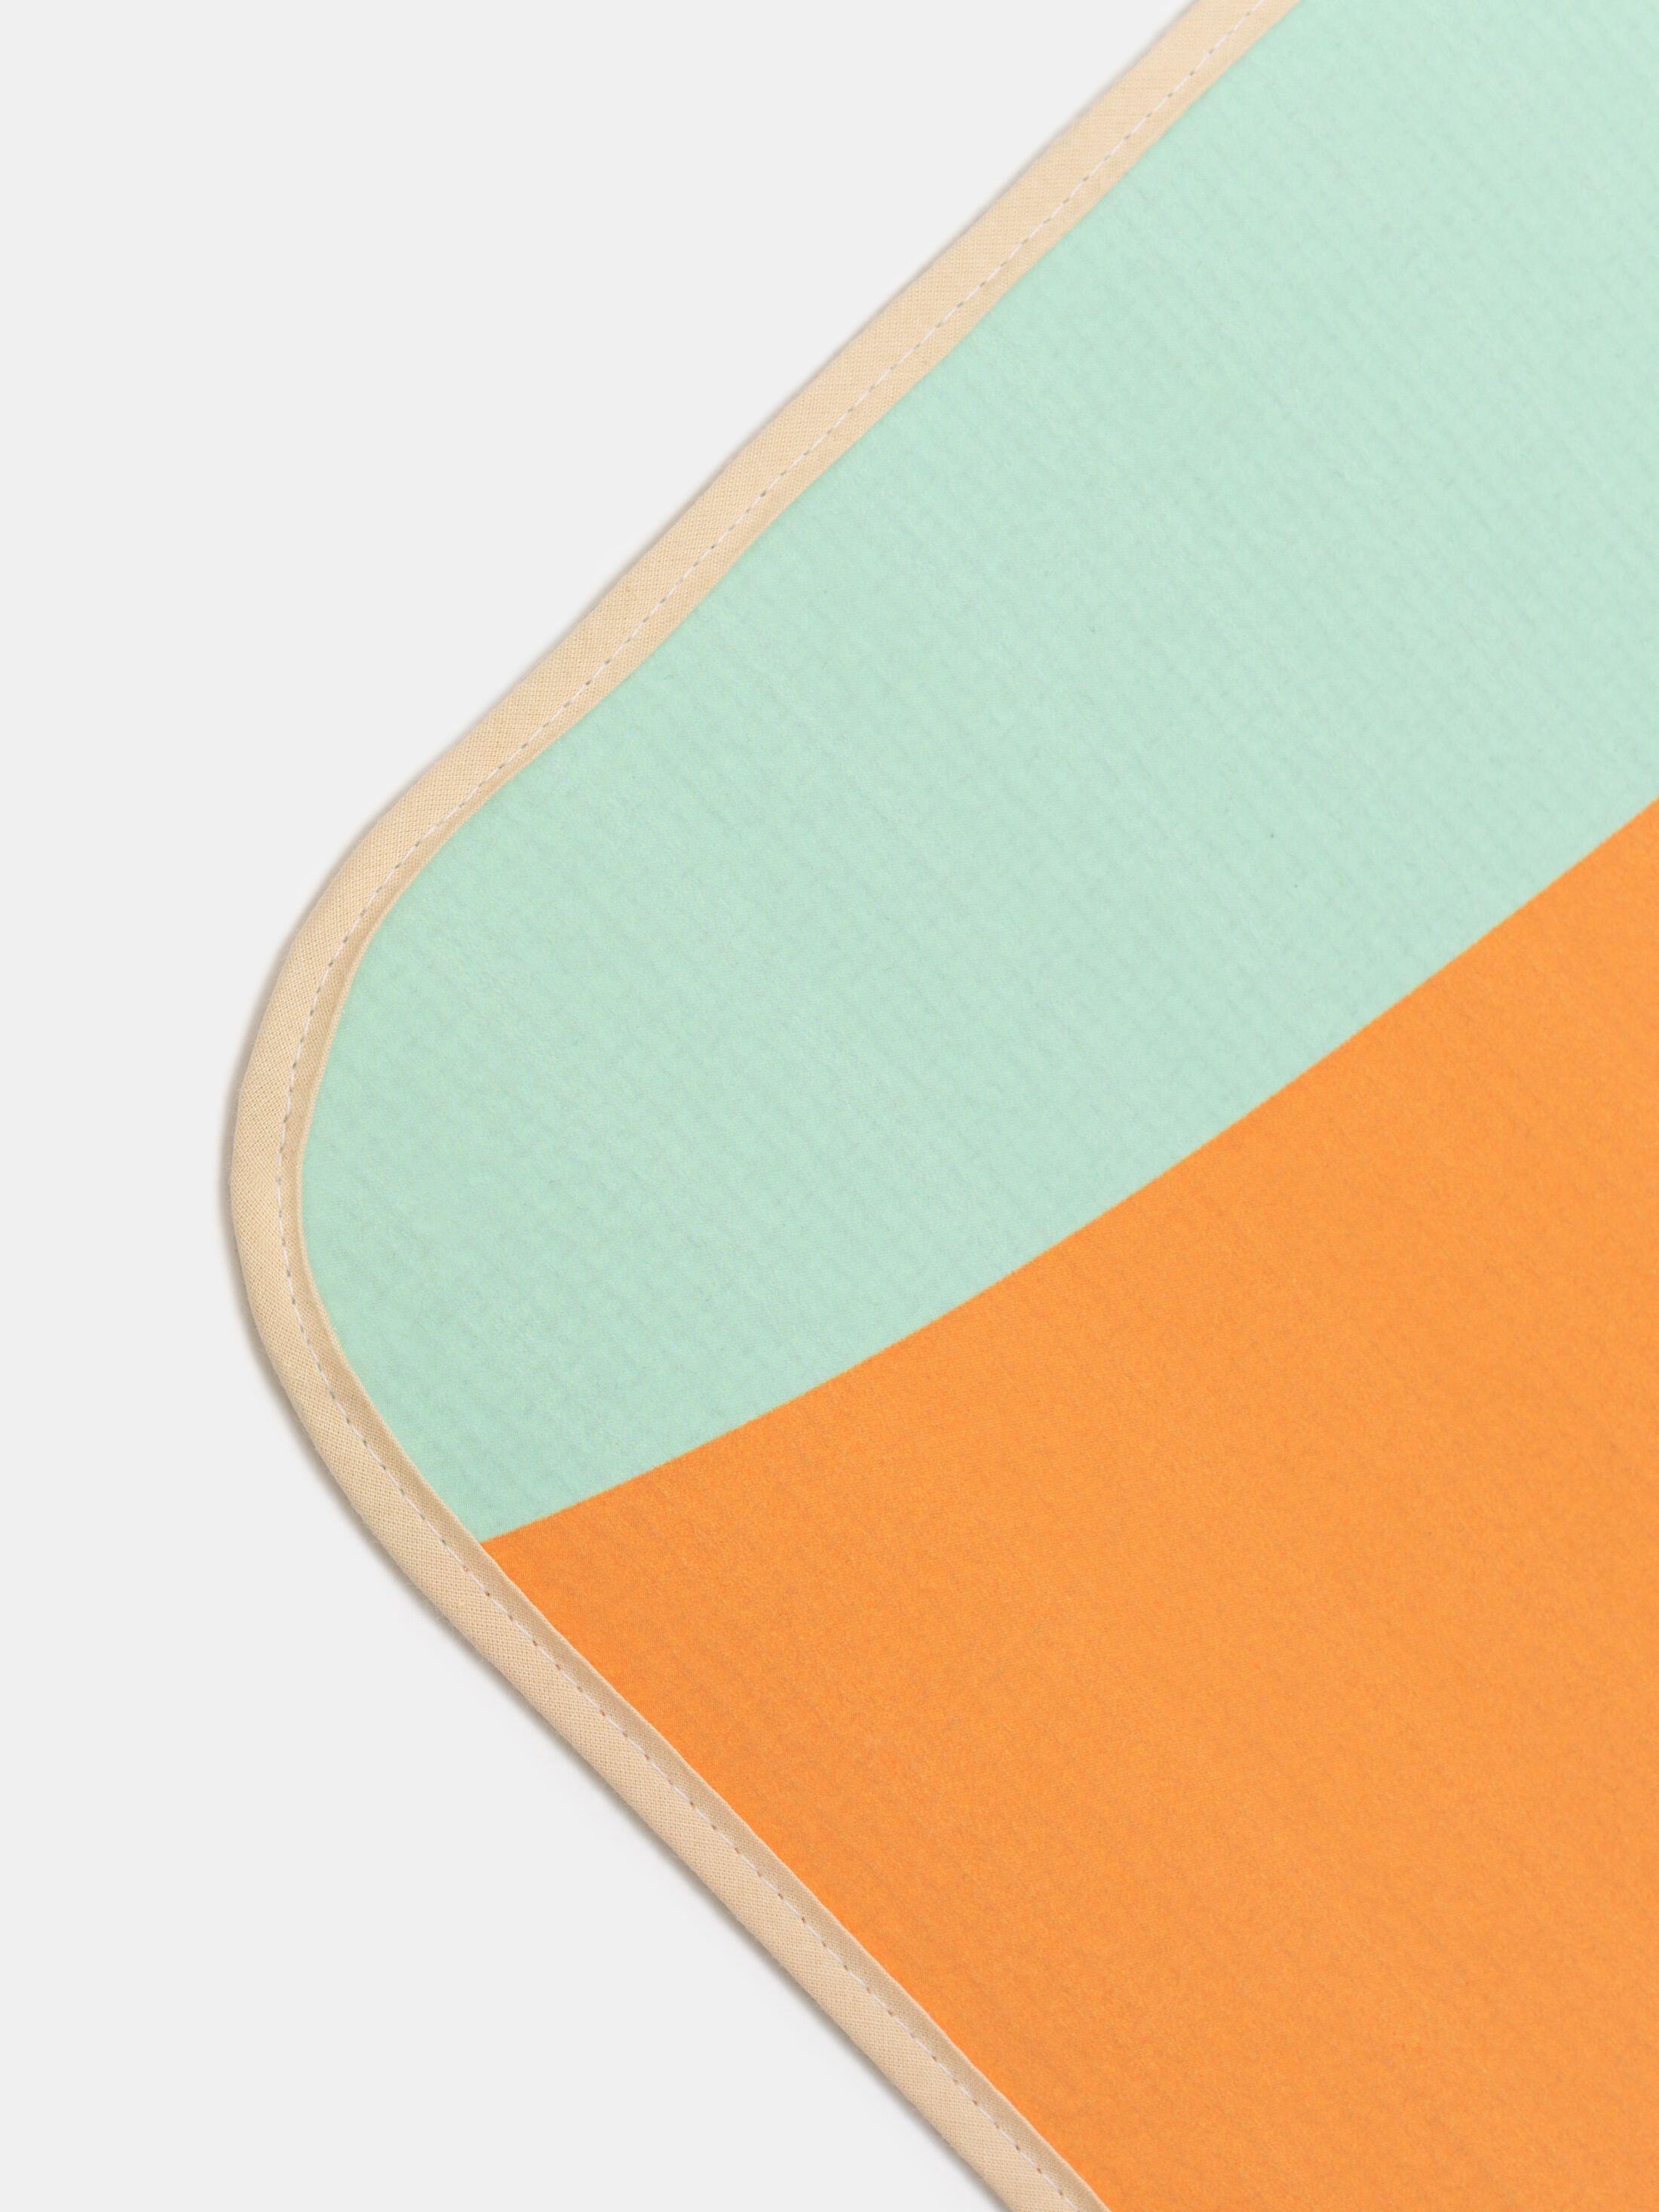 customised yoga mats